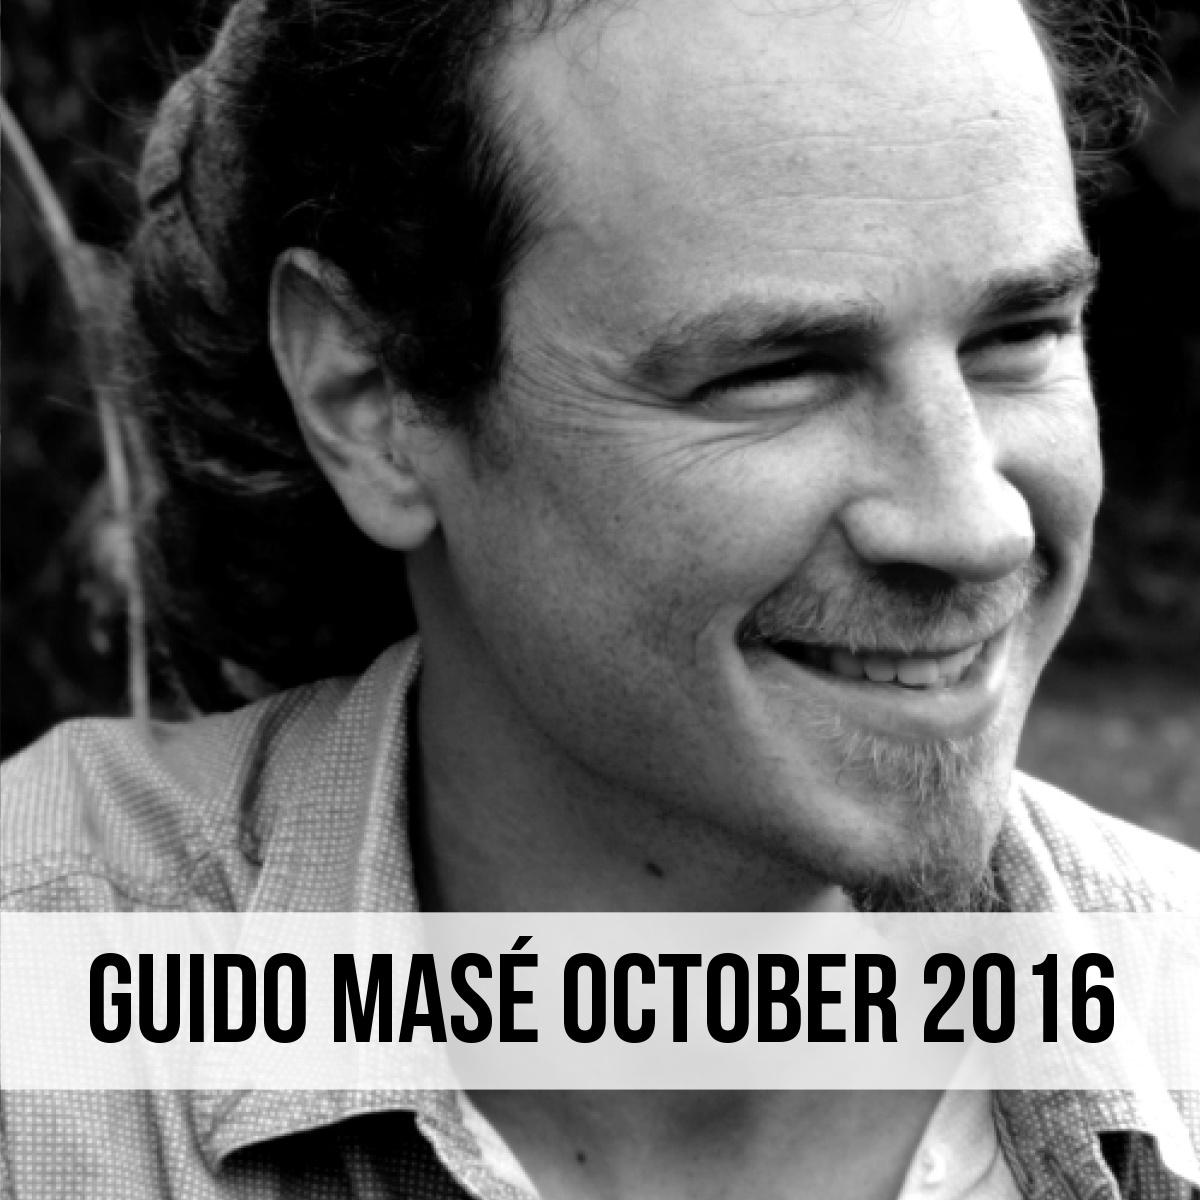 Guido Mase